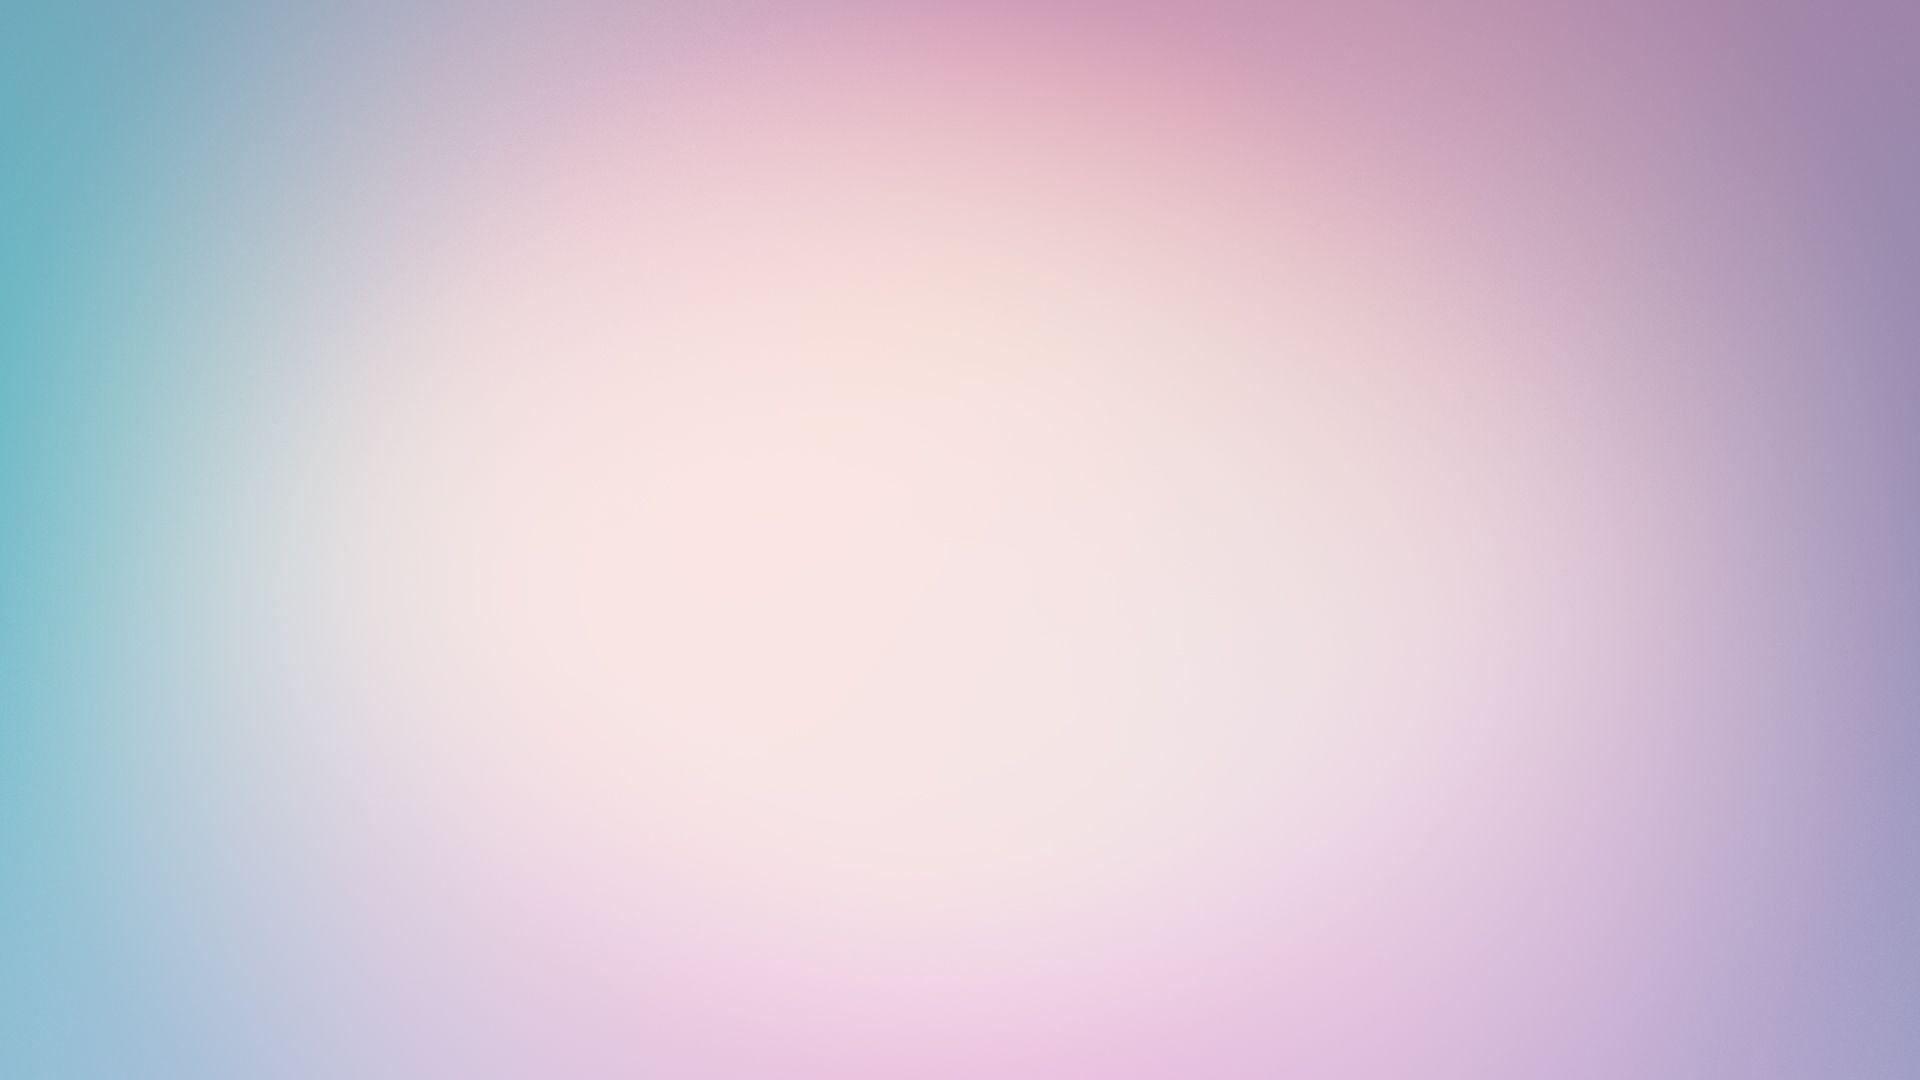 Light Gradient Wallpaper 26039 26724 Hd Wallpapers